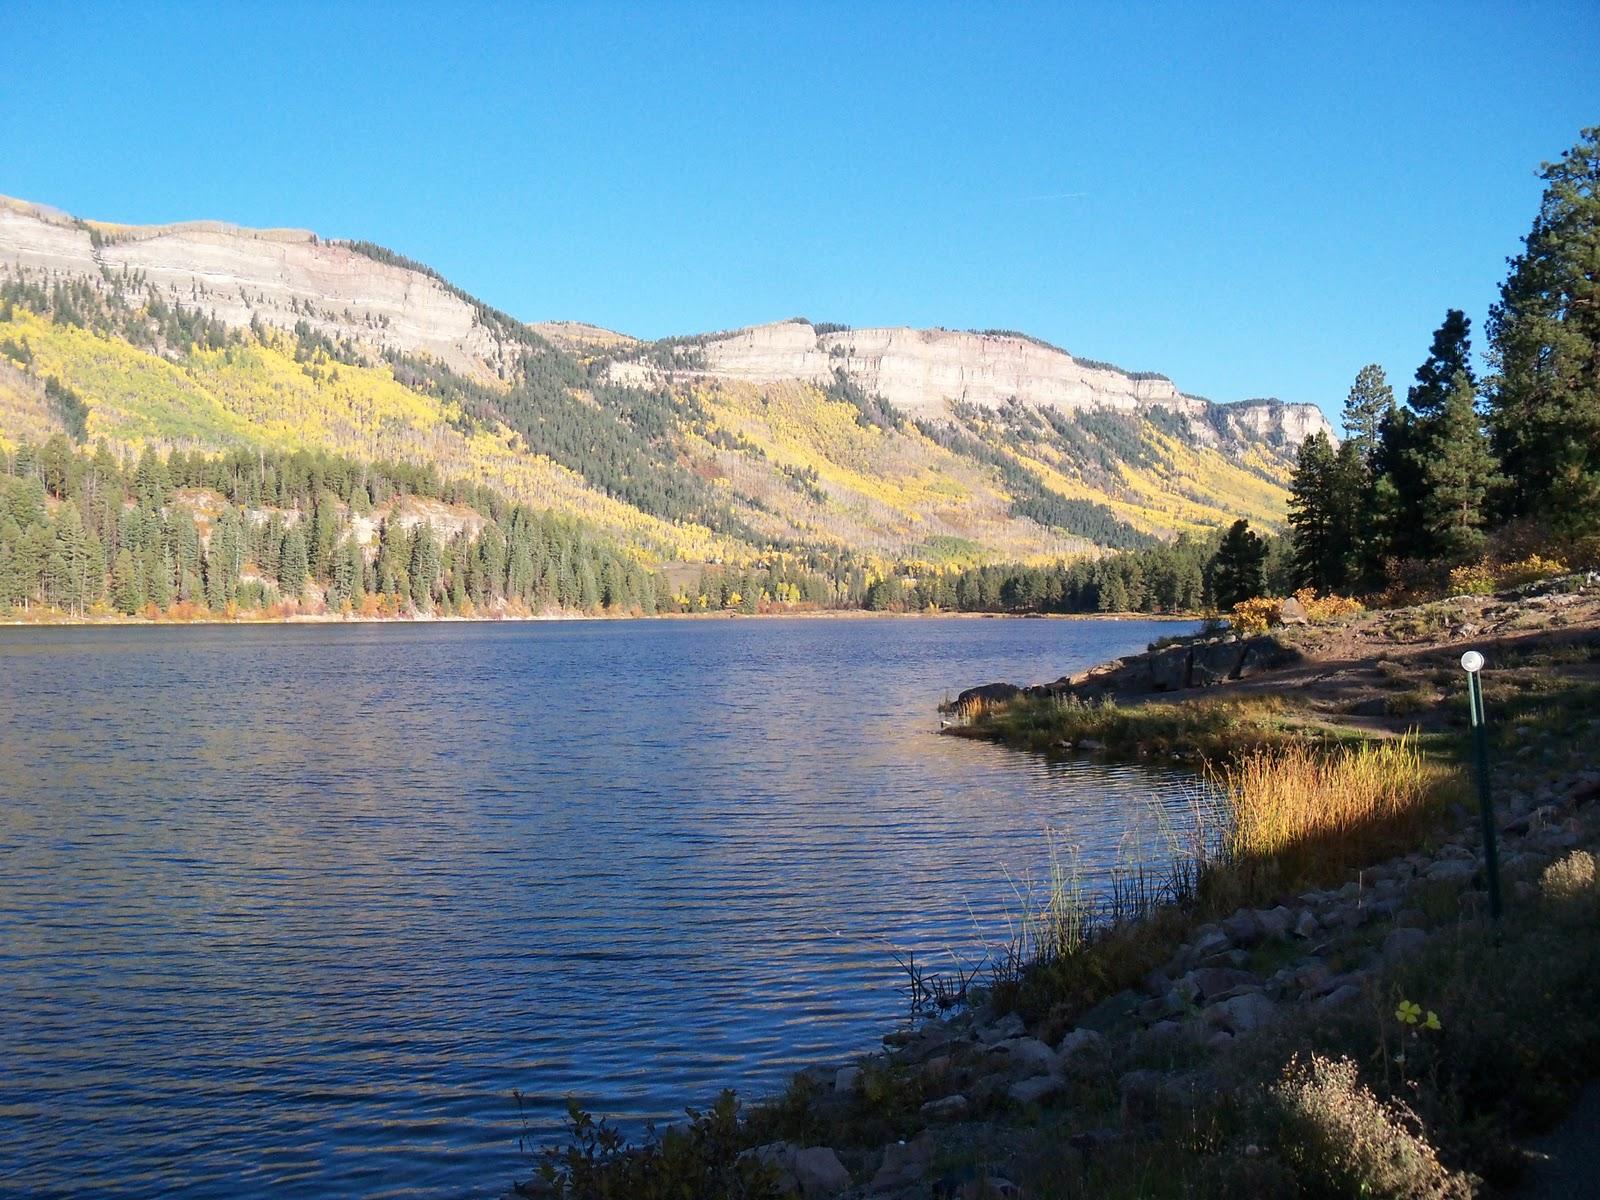 Trail and park reviews haviland lake campground durango for Noleggio di durango cabinado colorado